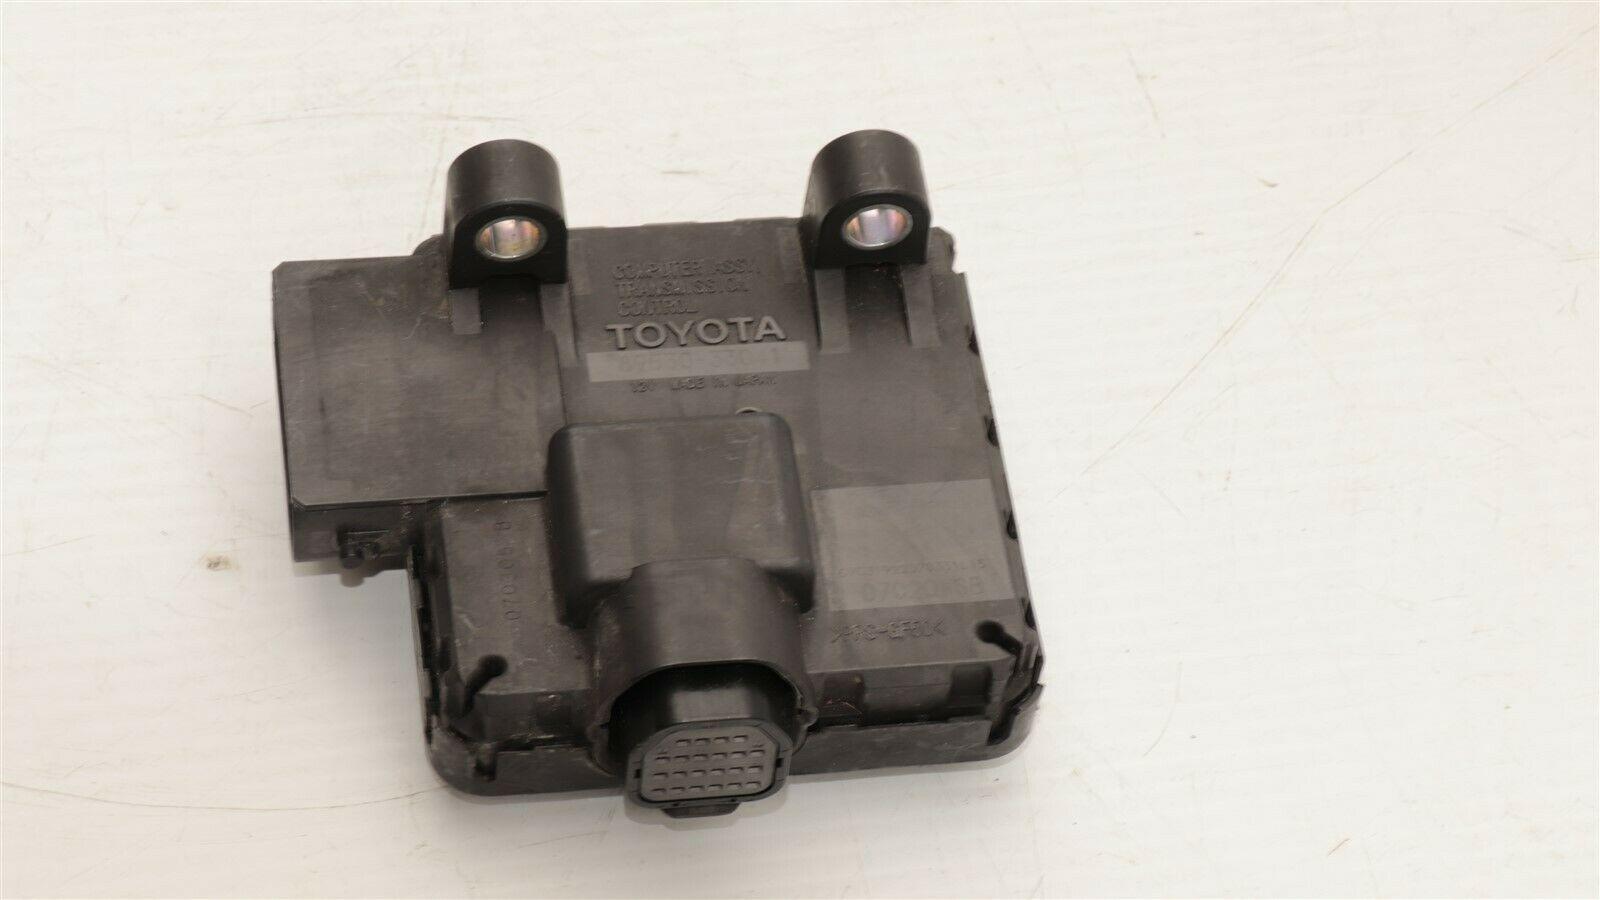 Lexus Toyota TCM TCU Automatic Transmission Computer Control Module 89530-33041